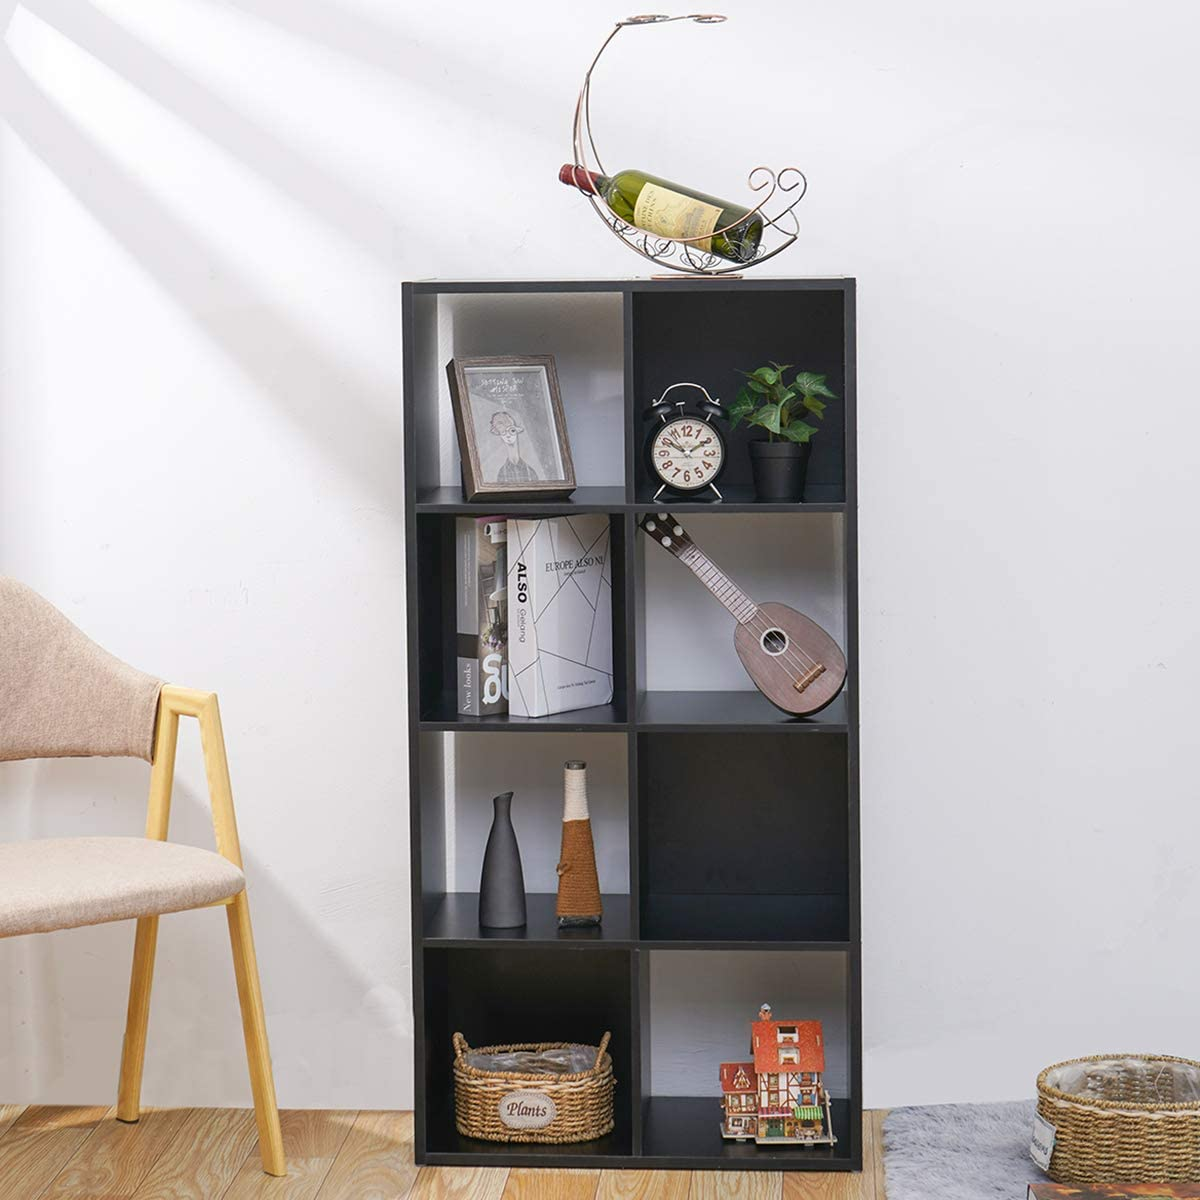 KINGSO 8 Cube Organizer 47.2 Bookshelf Bookcase, Vintage Walnut Finish Cube Storage Shelves Bedroom Furniture Living Room Furniture Black